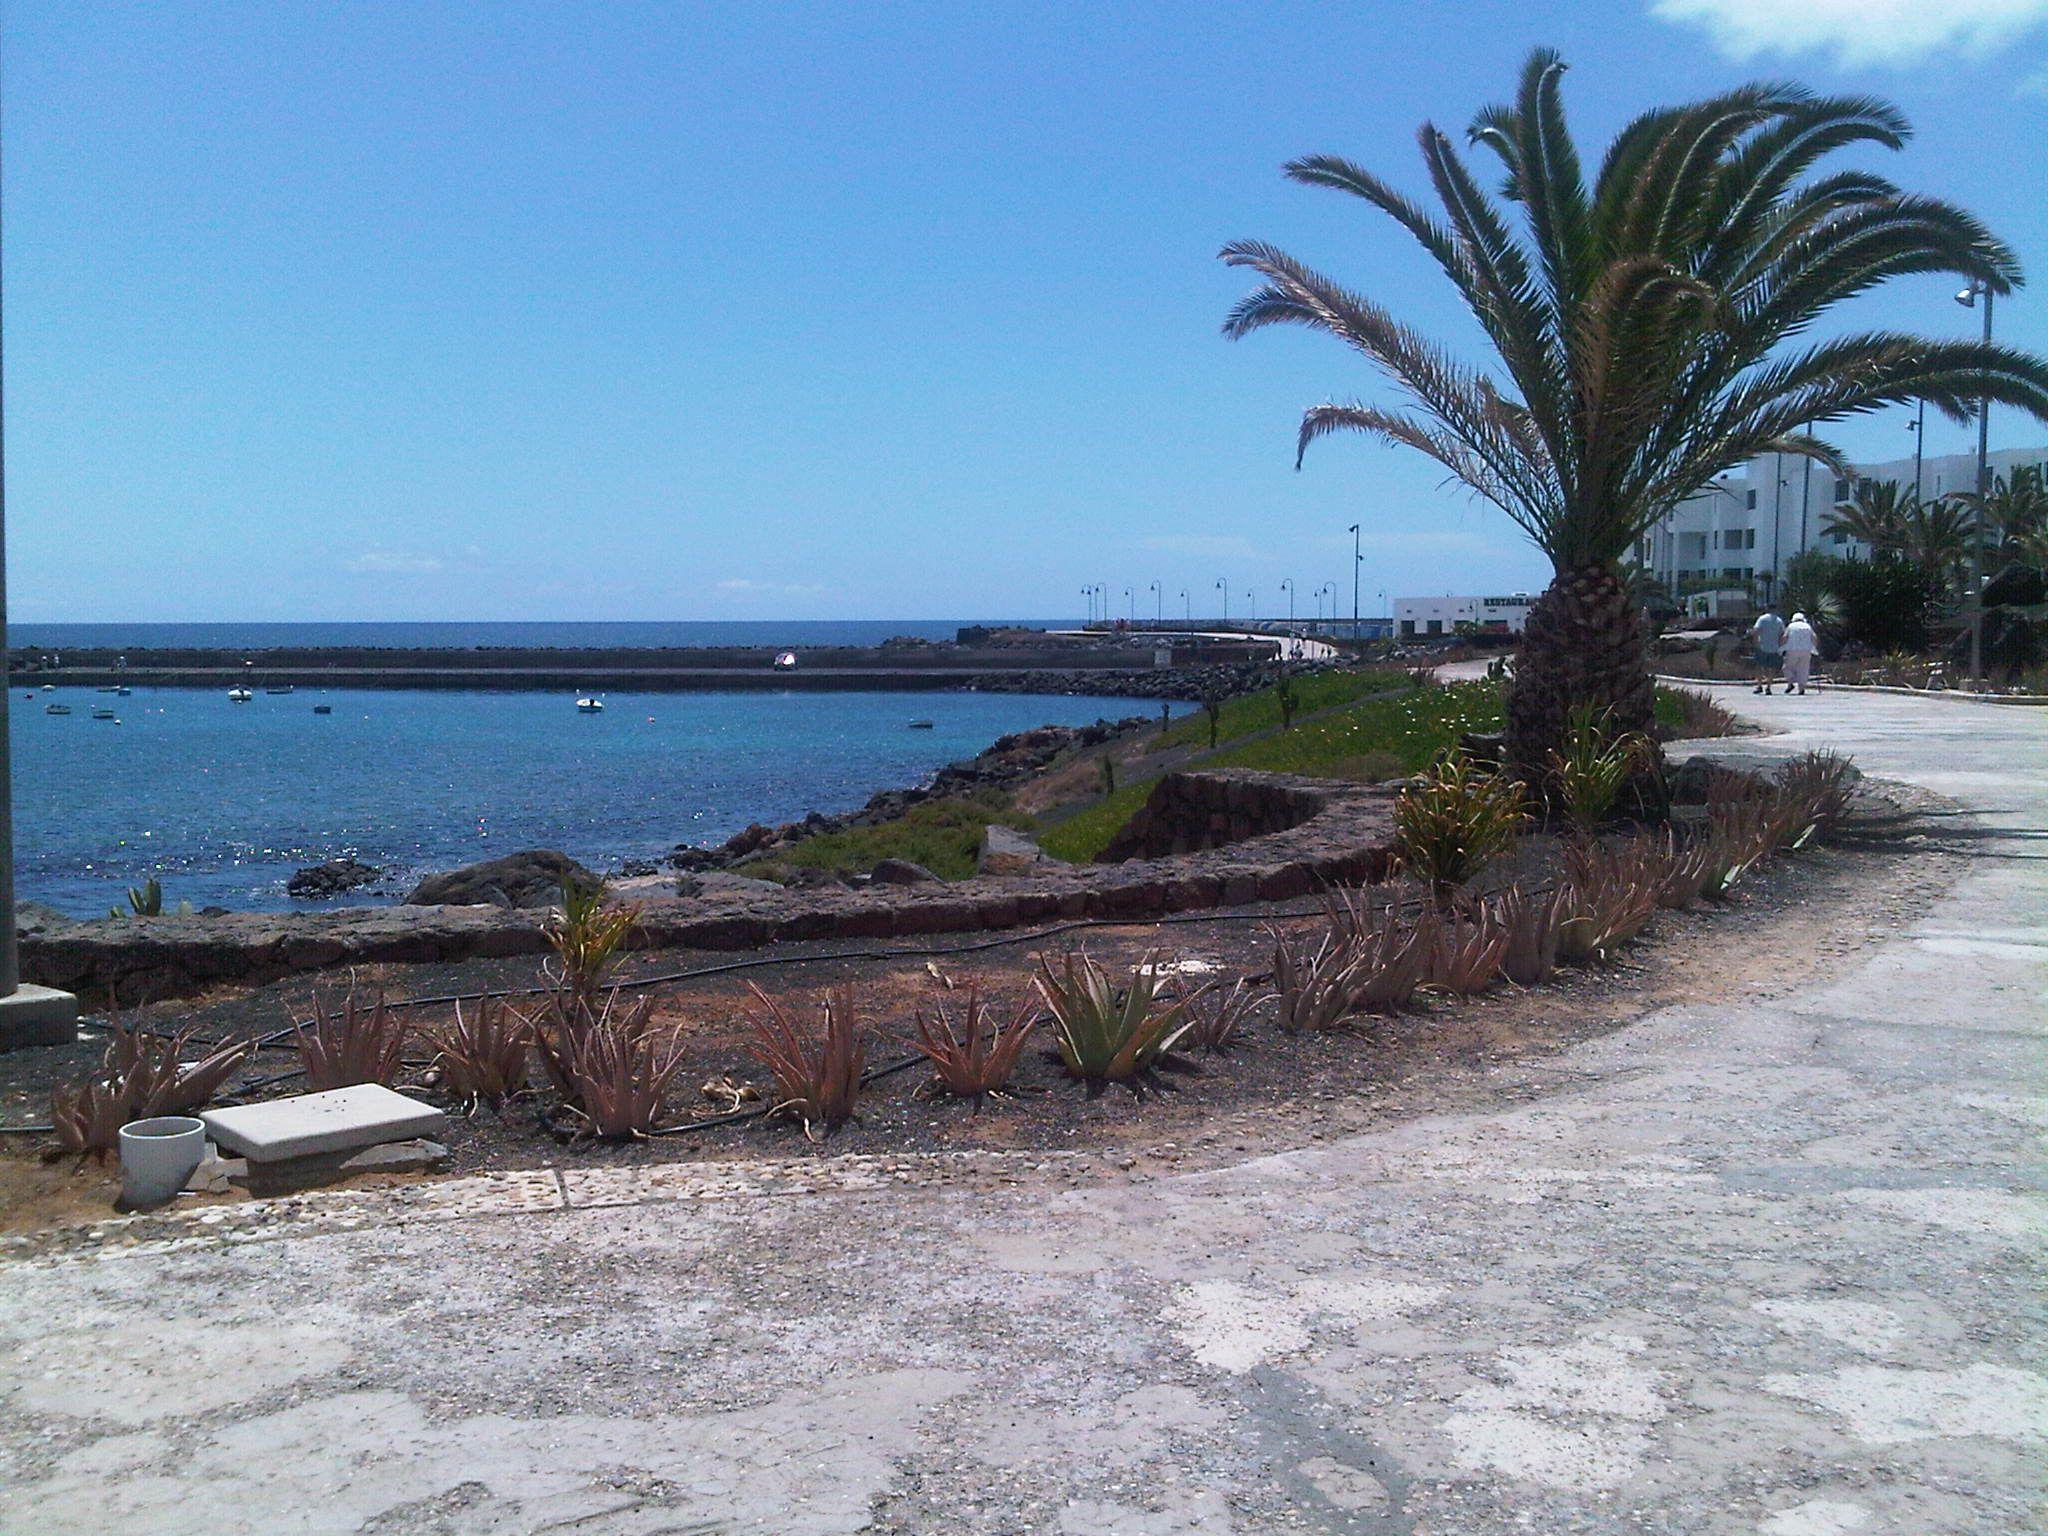 Walking down the Promenade in Costa Teguise, Lanzarote